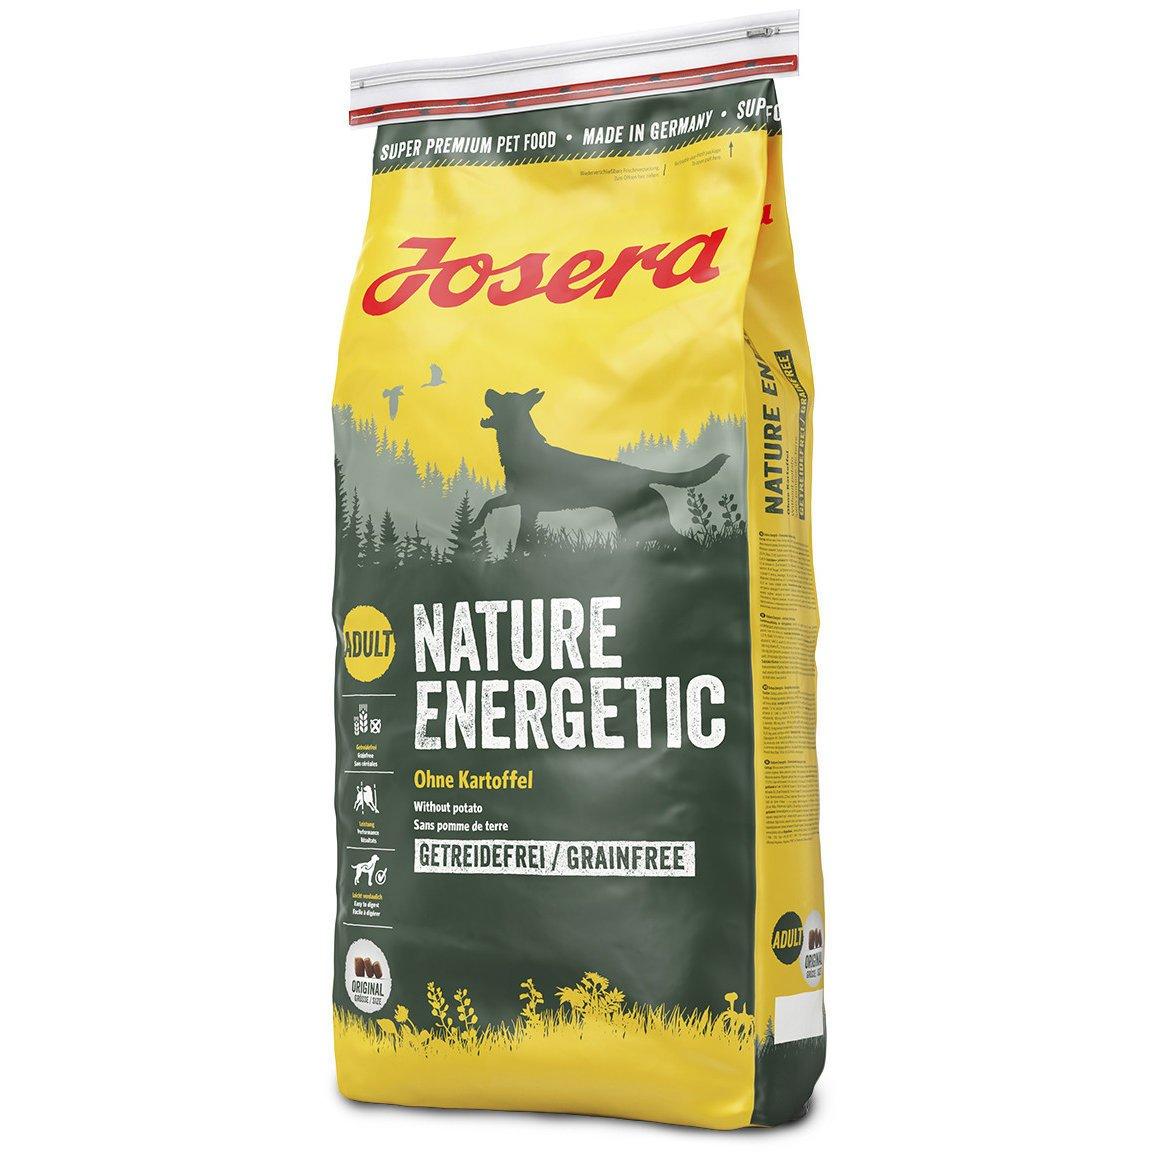 Josera Nature Energetic getreiefrei, Bild 2